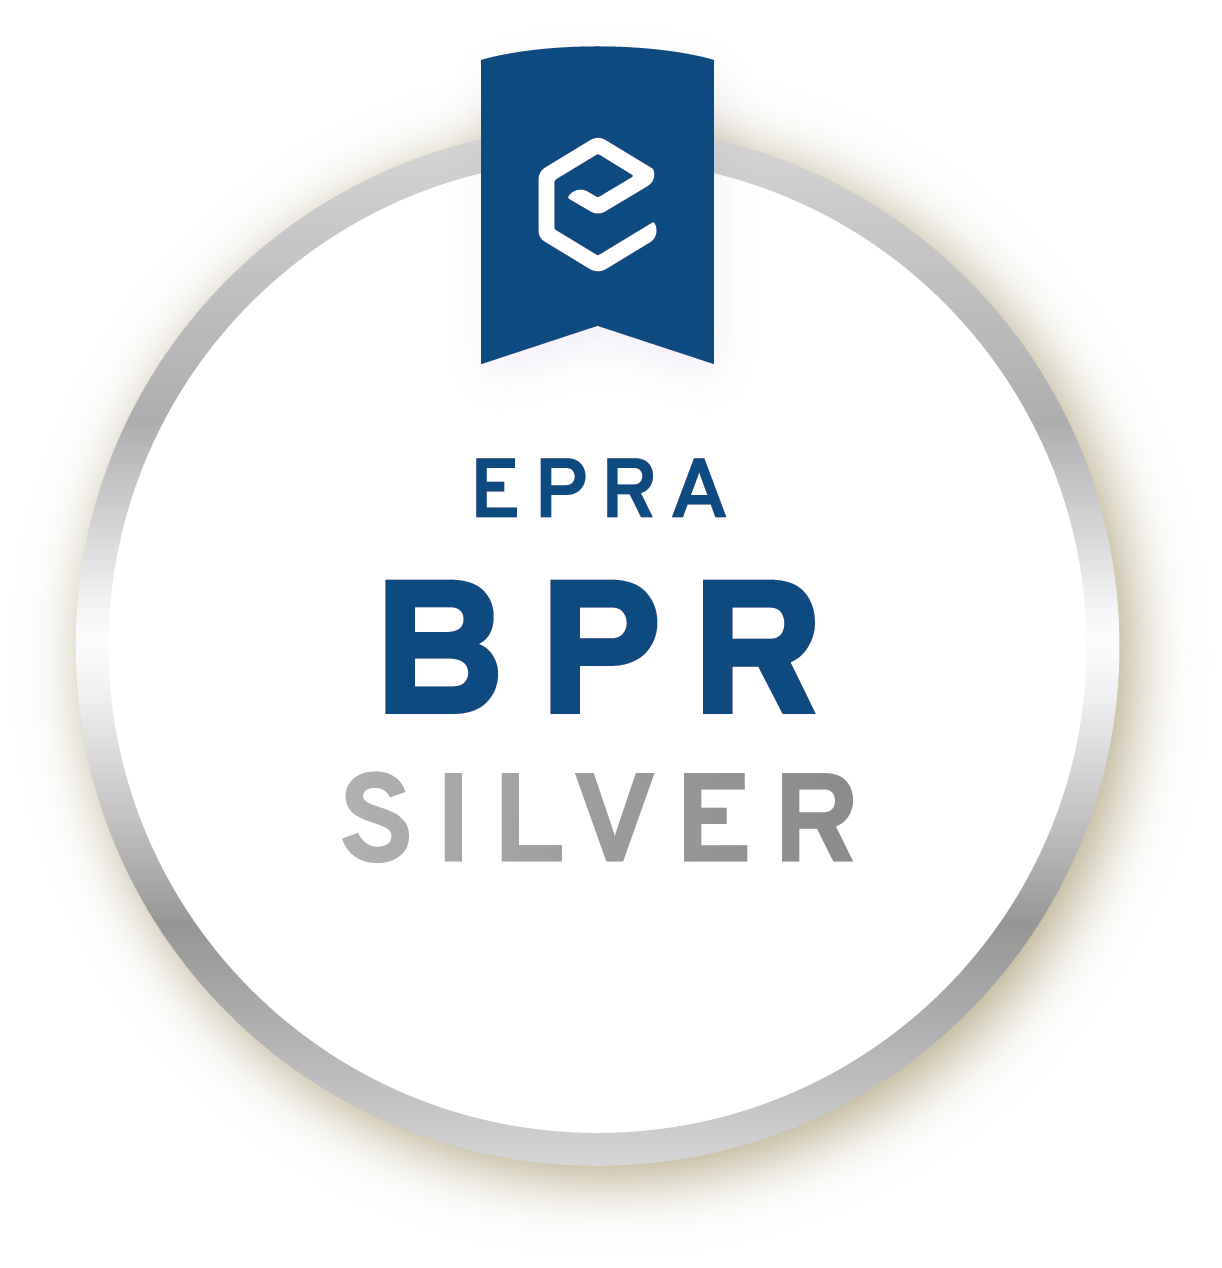 BPR Award Silver